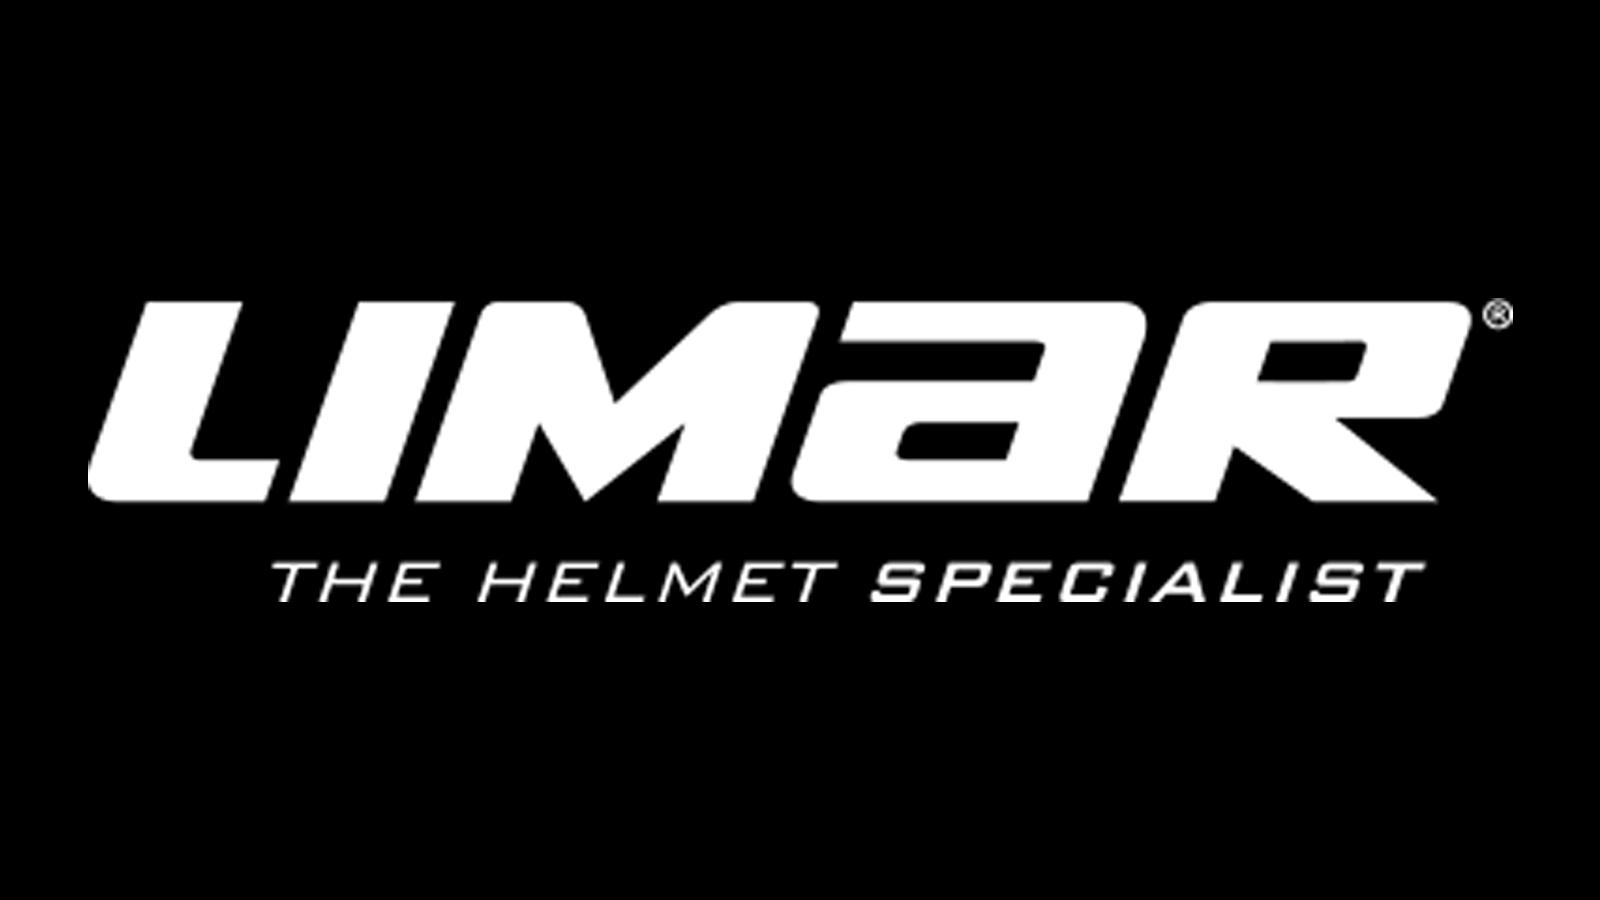 Limar Tour Series